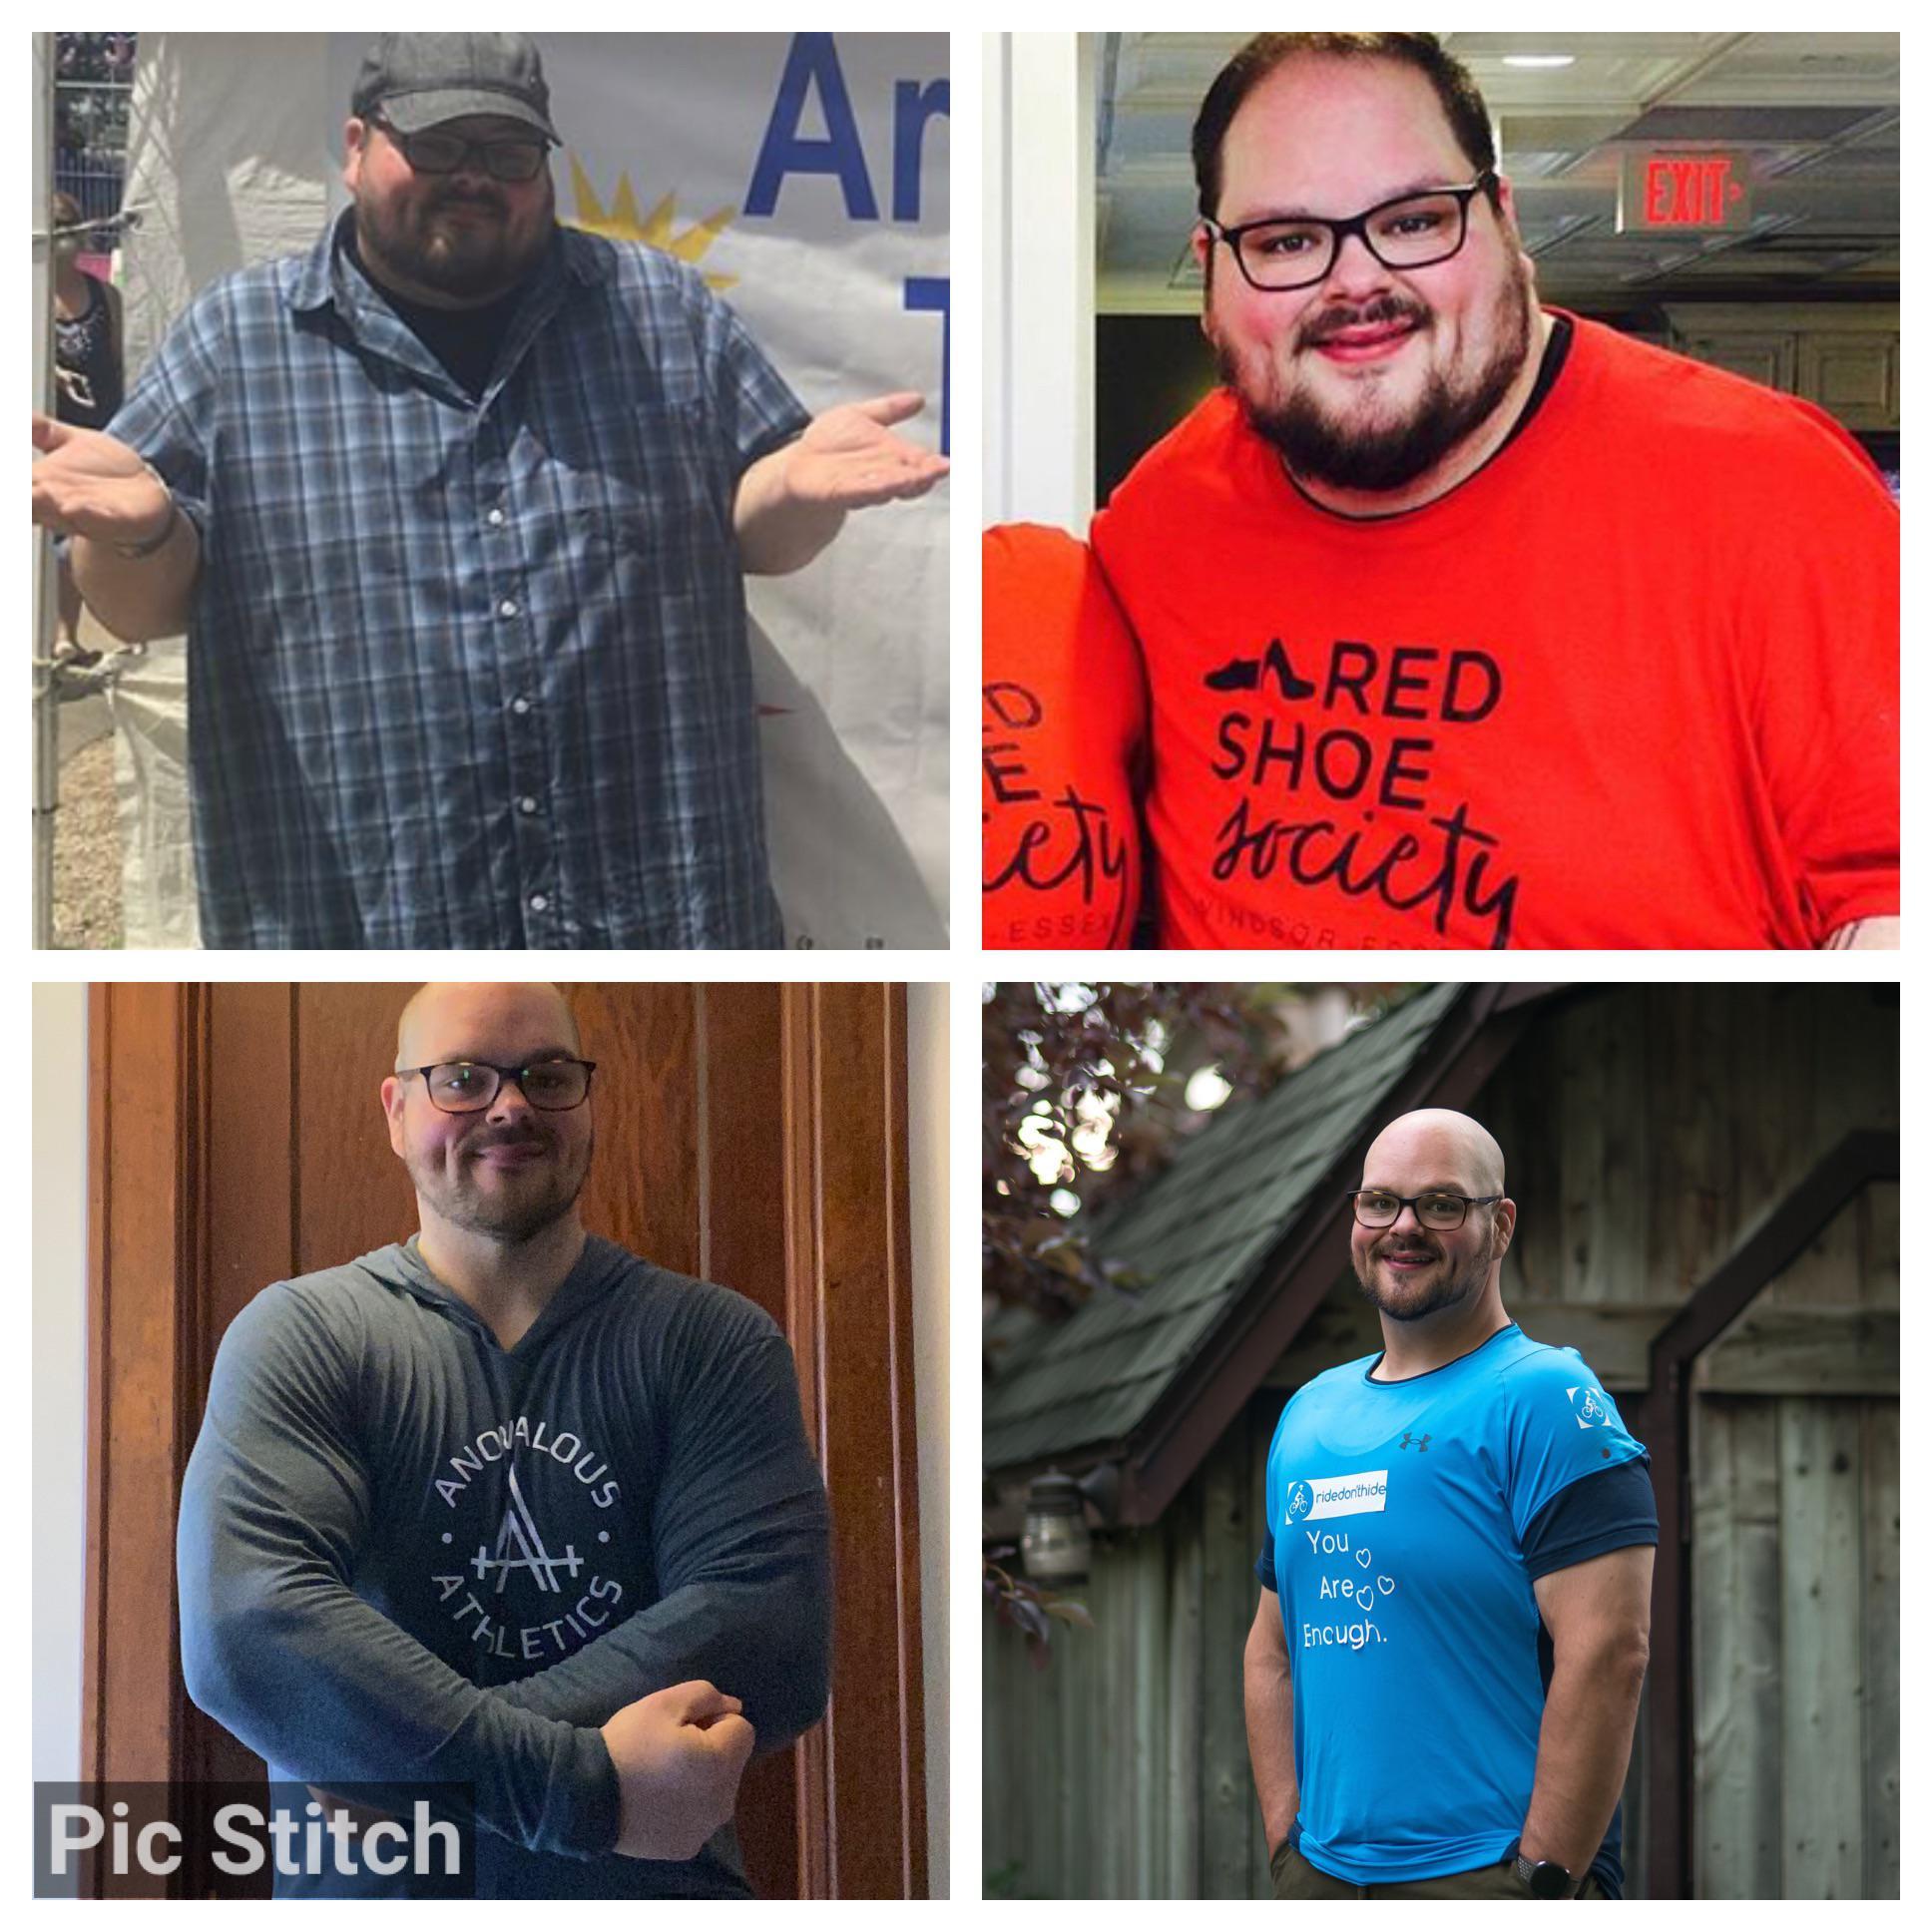 Progress Pics of 170 lbs Weight Loss 5'10 Male 400 lbs to 230 lbs